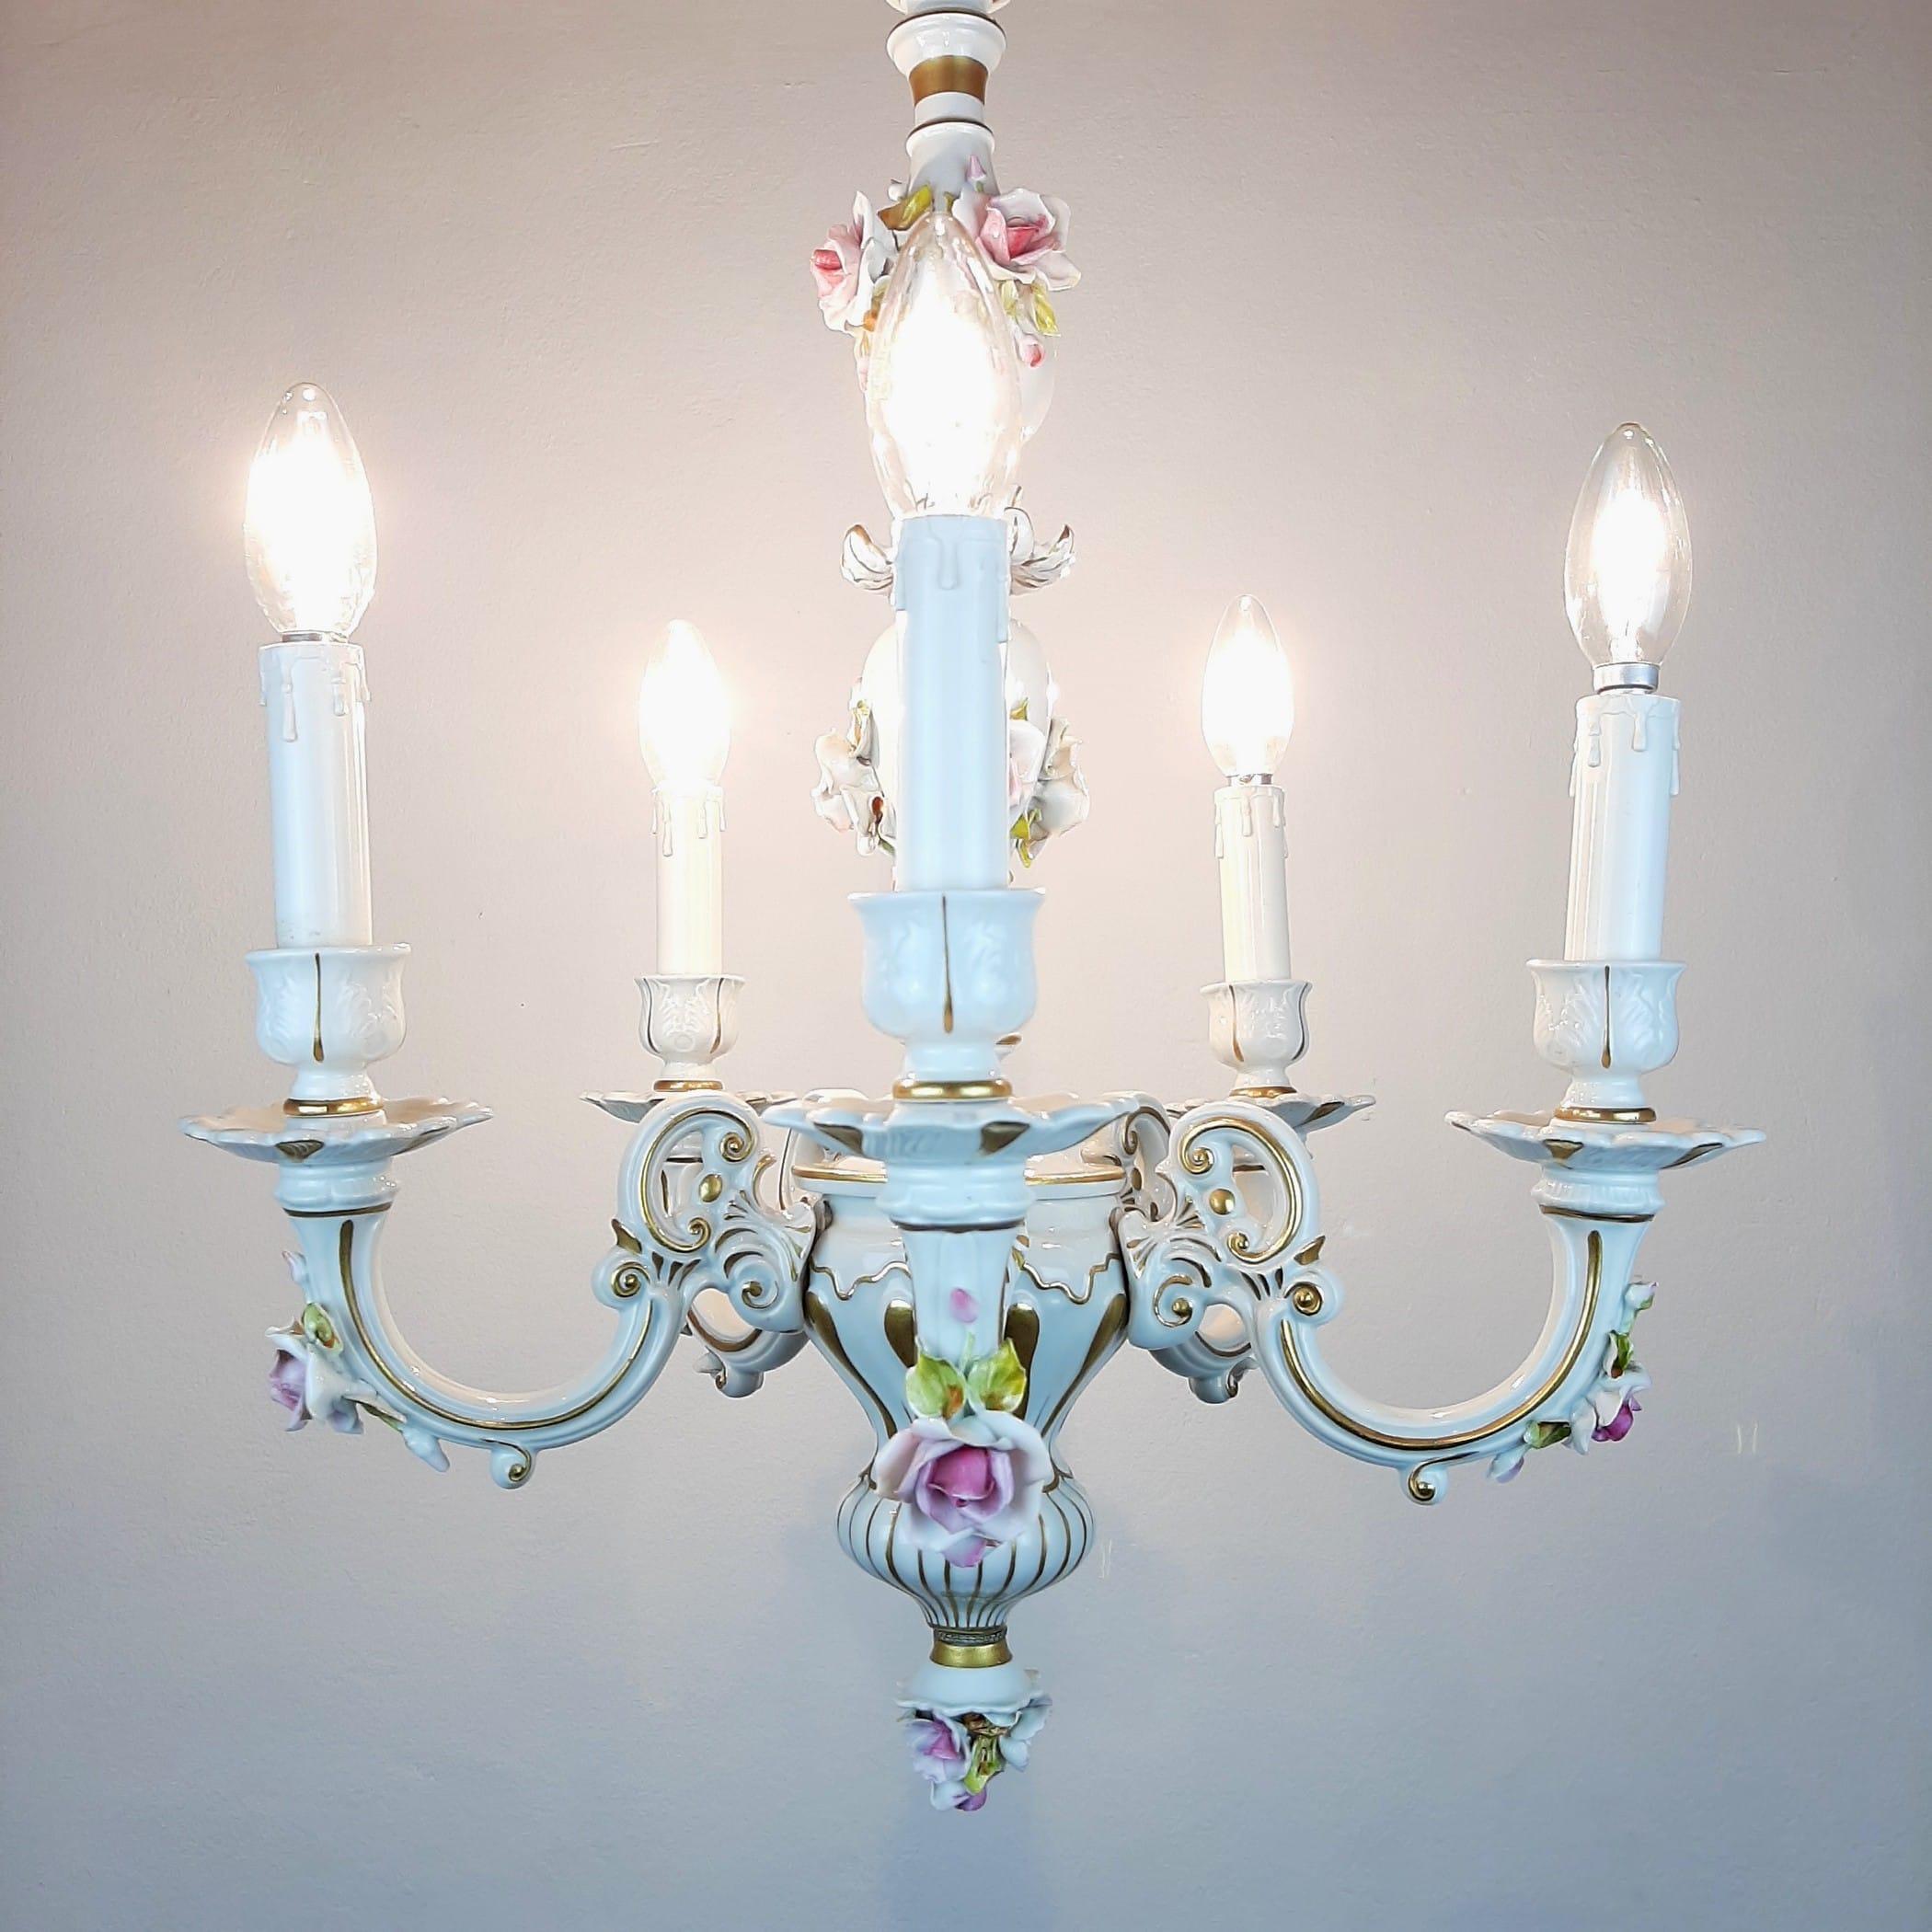 Vintage Capodimonte porcelain 5 arm chandlier Italy 1940s Baroque Ceramic Chandelier Shabby chic Flower Porcelain Chandelier